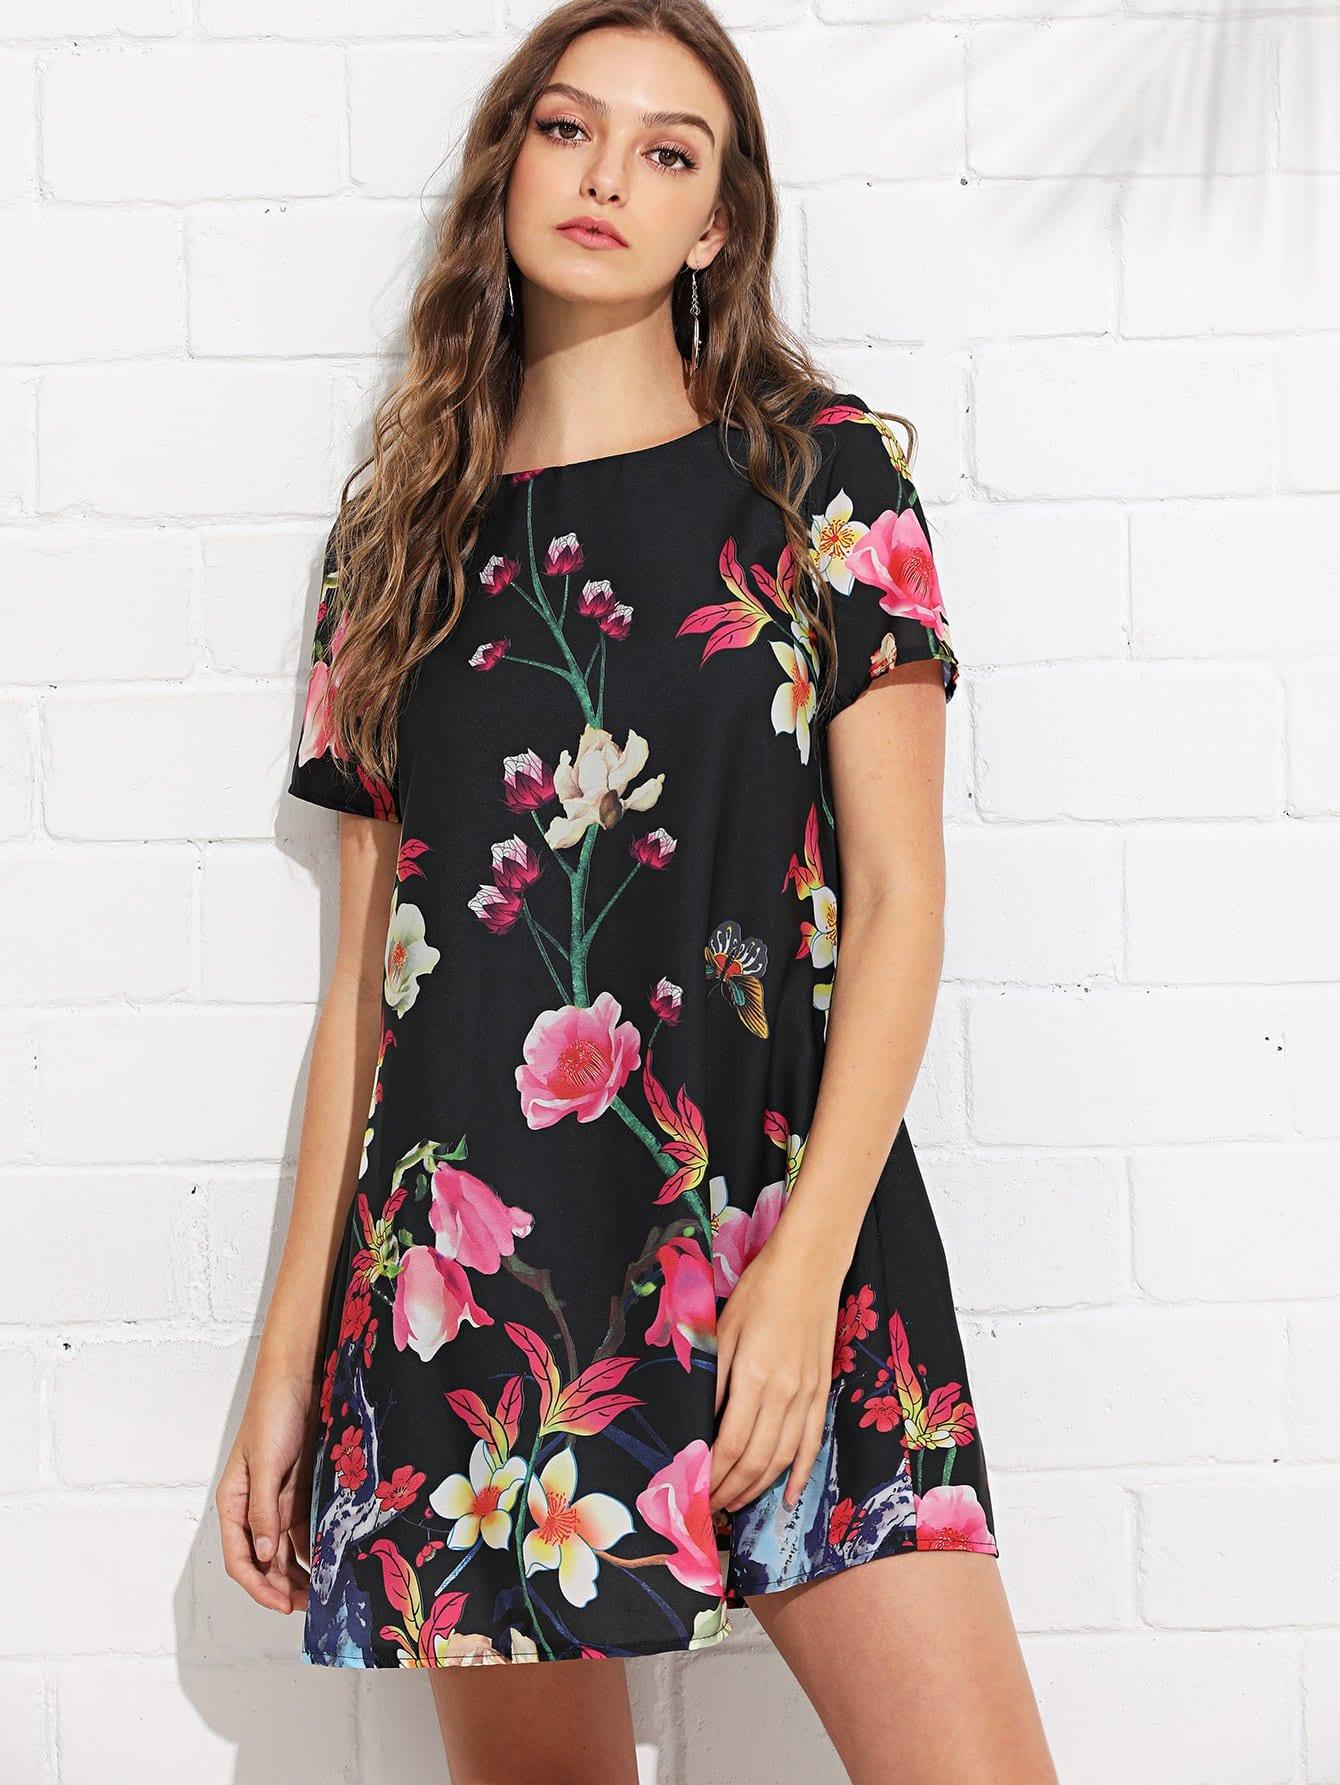 Botanical Print Swing Dress scalloped edge botanical print dress